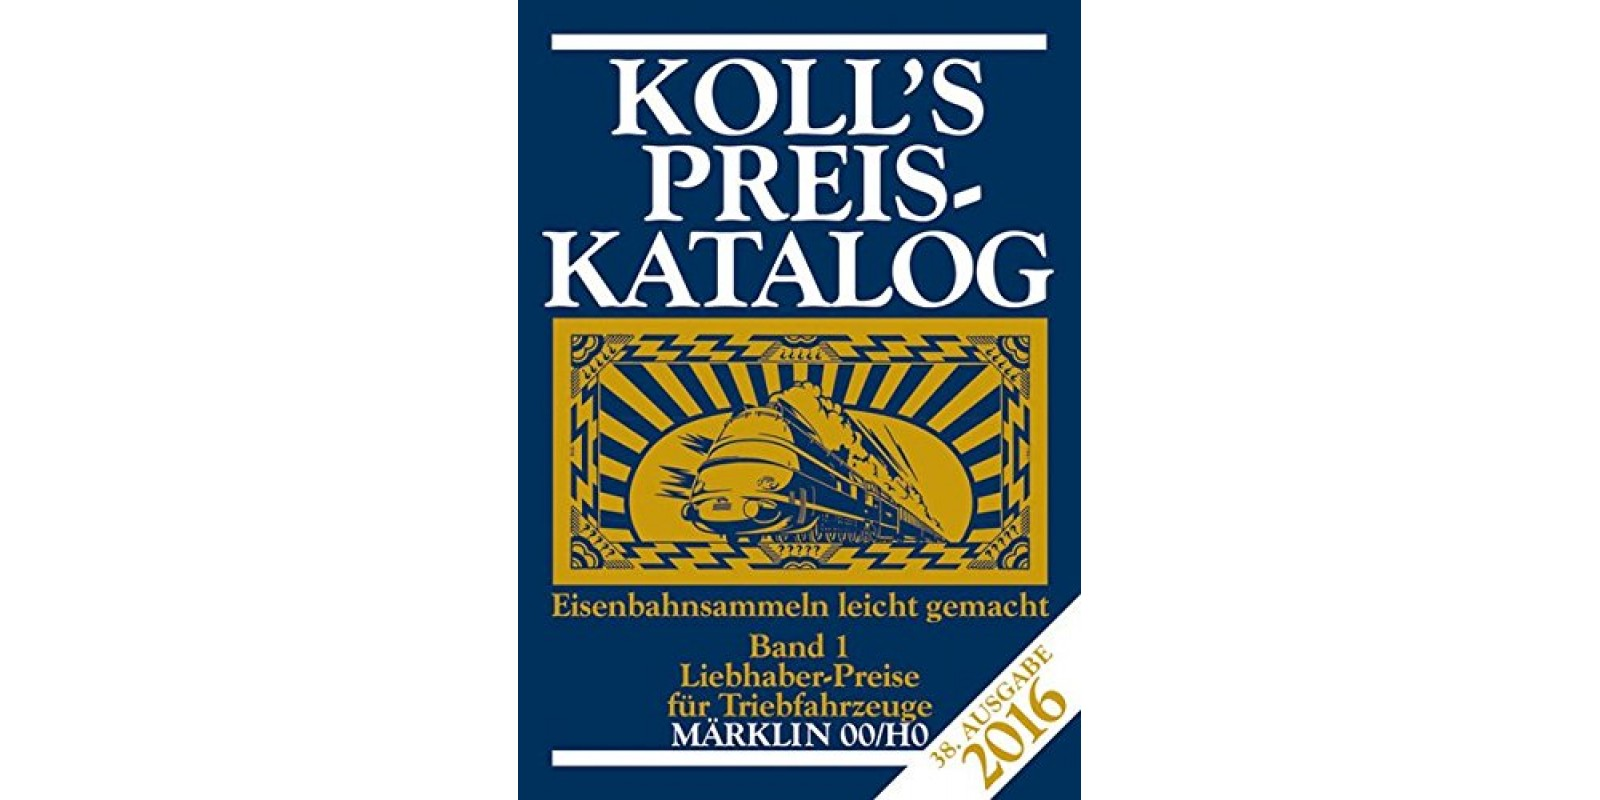 KOKA12016 Koll's Preiskatalog Band 1 ,2016